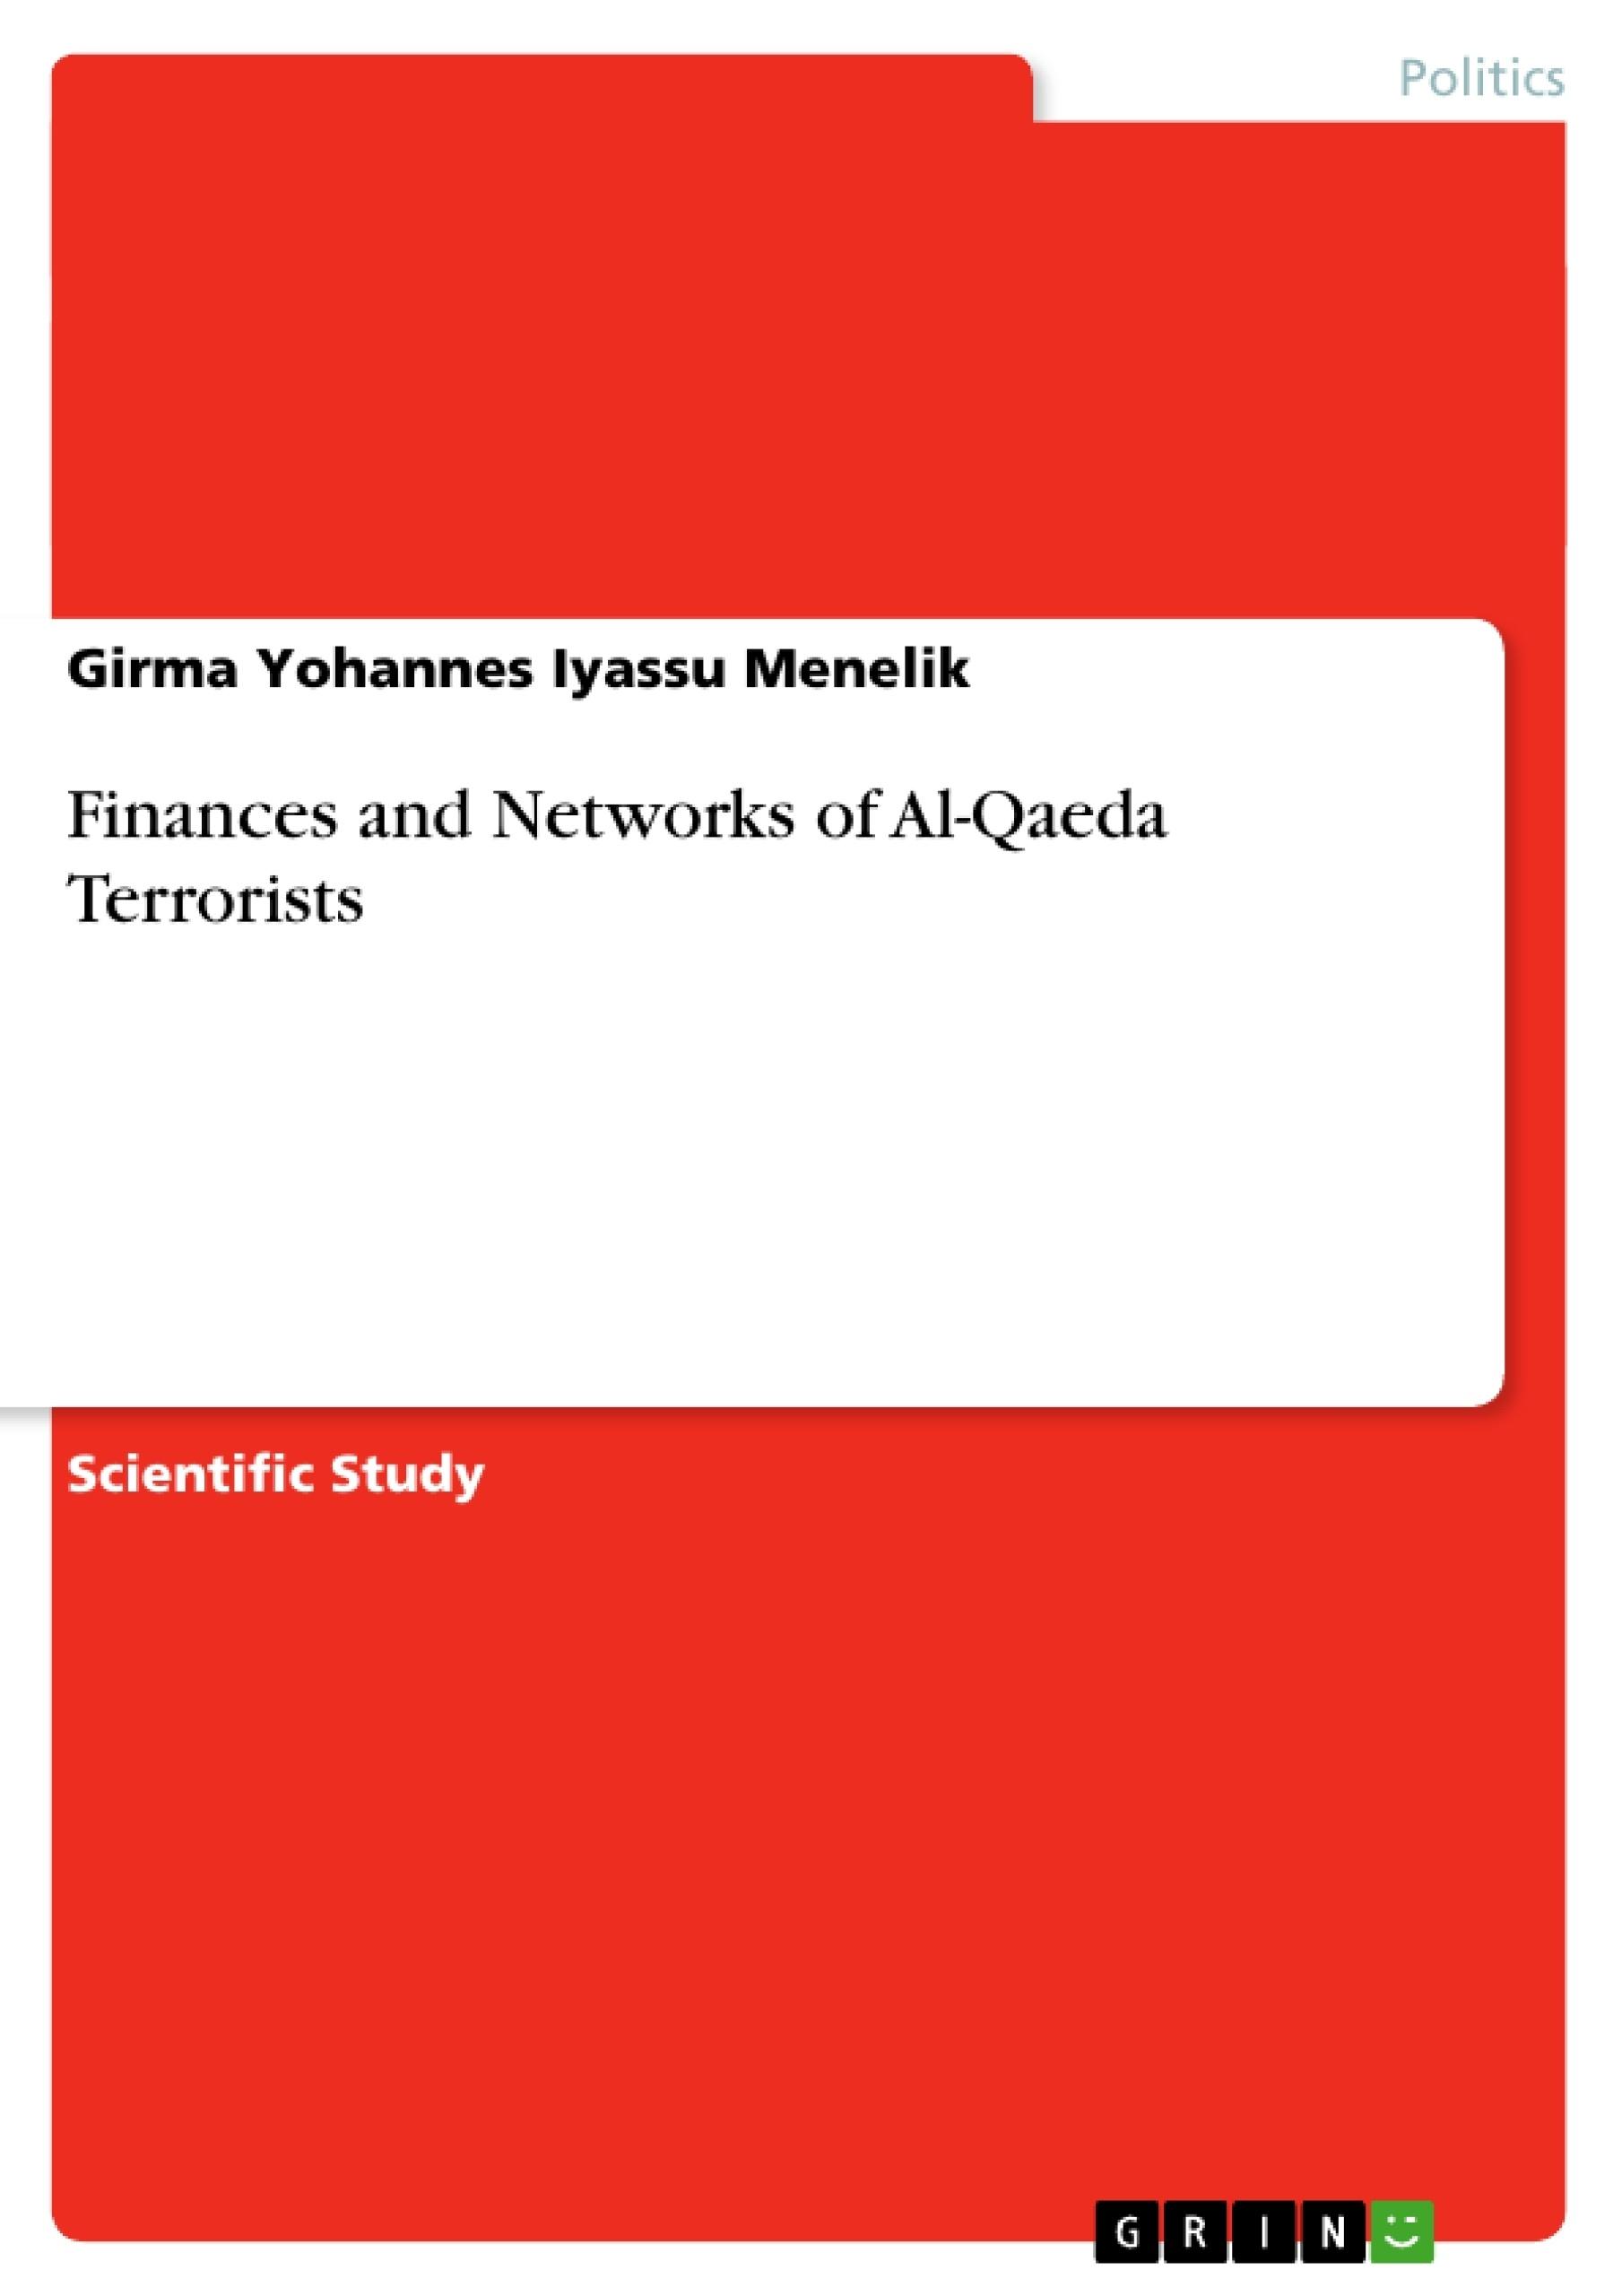 Title: Finances and Networks of Al-Qaeda Terrorists